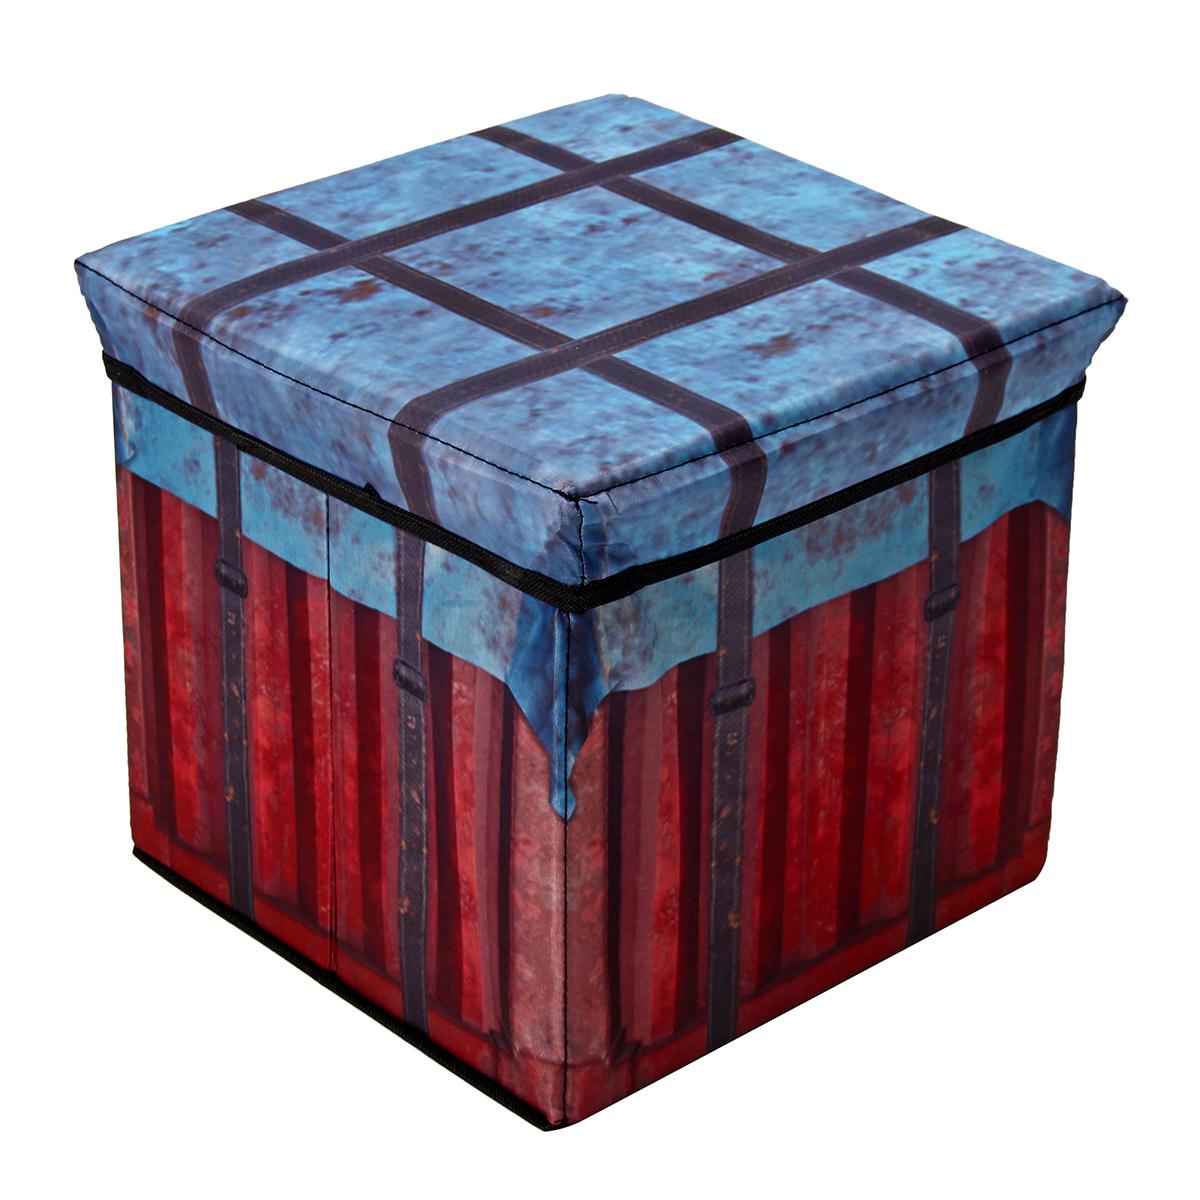 Folding-Ottoman-Storage-Cube-Footstool-Stool-Blanket-Box-Pouf-Oxford-Cloth-2Size